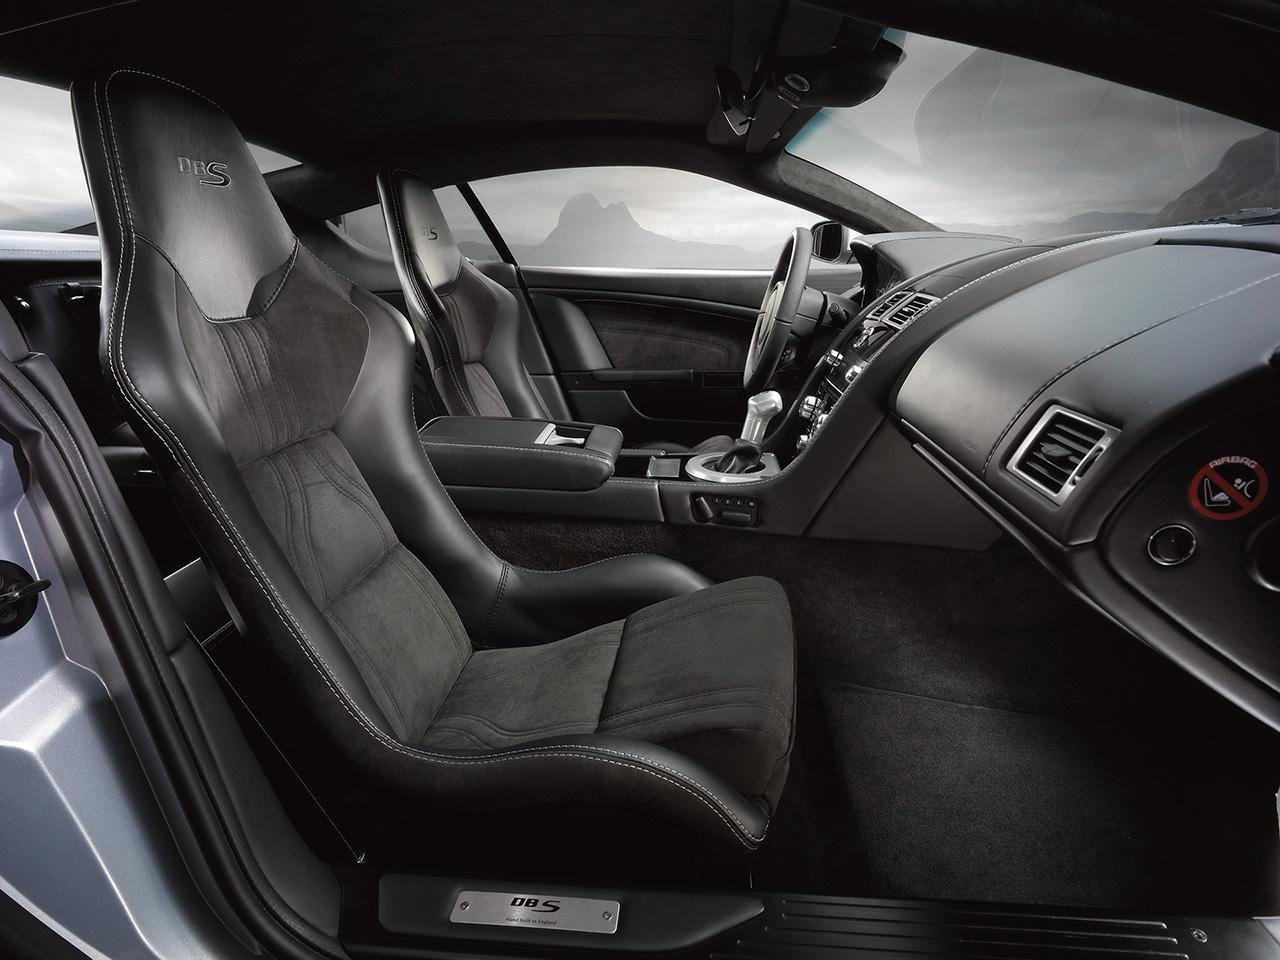 Aston Martin Dbs Price Aston Martin Dbs Aston Martin